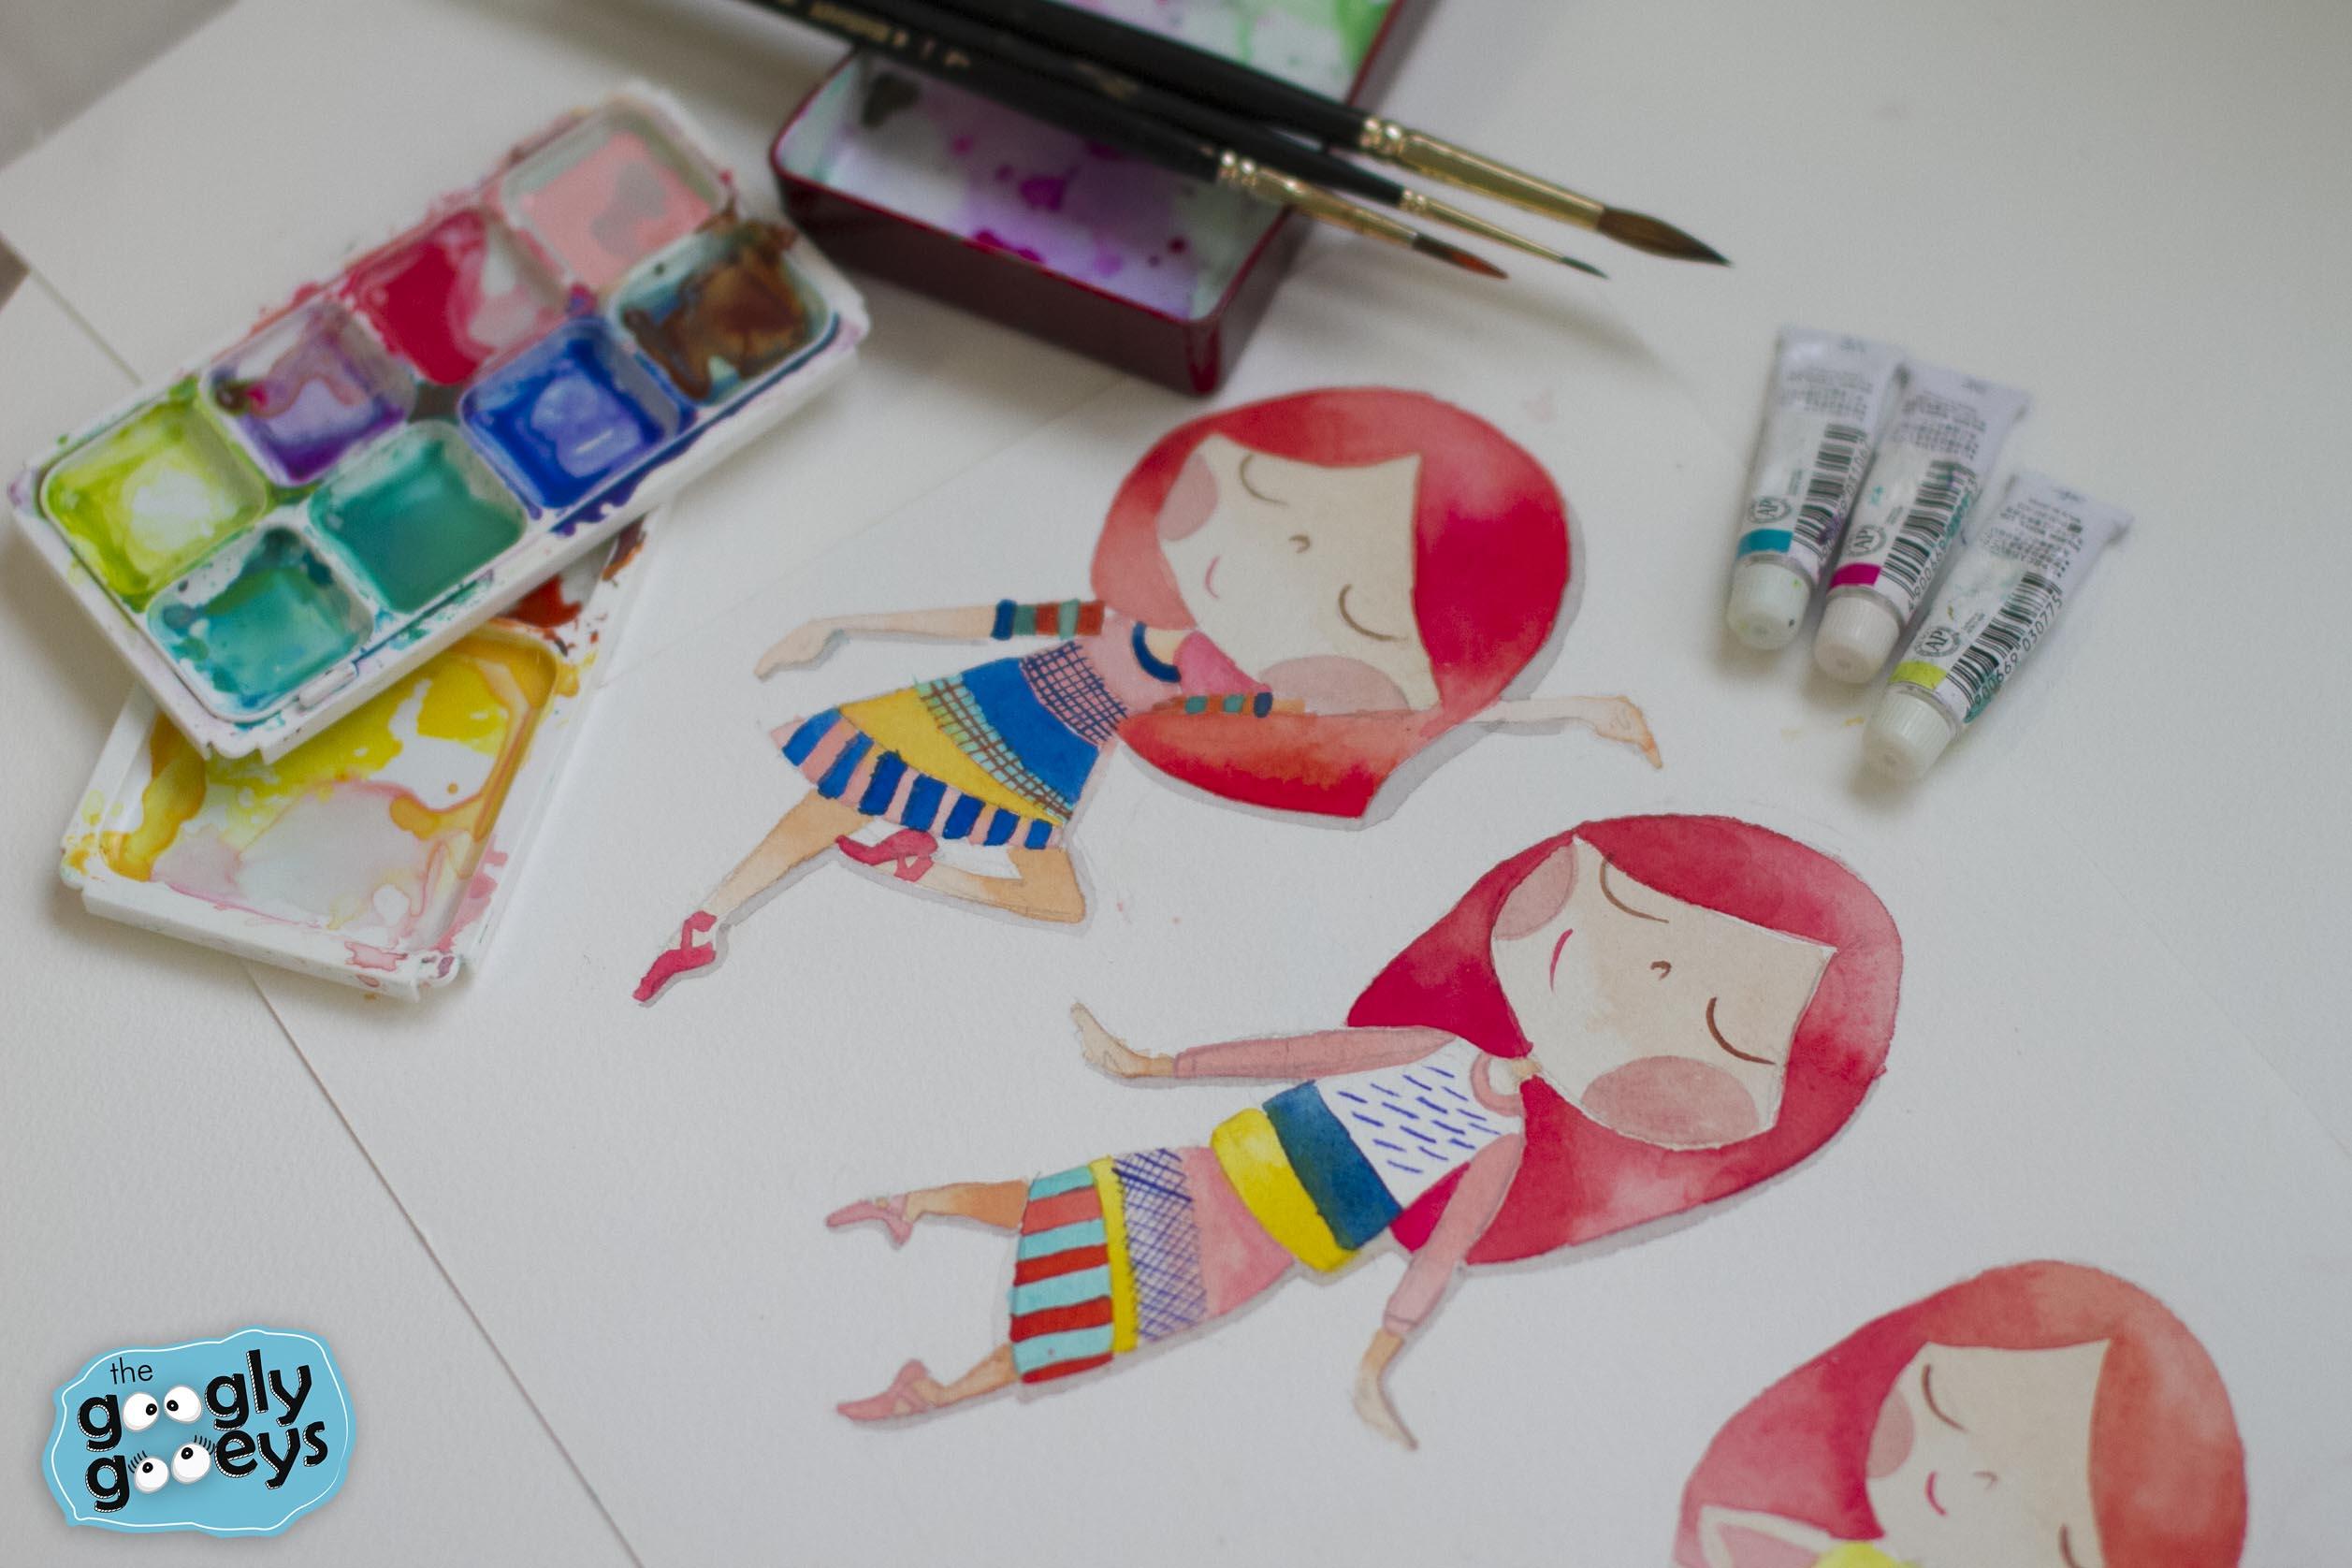 Watercolor & Digitizing Workshops